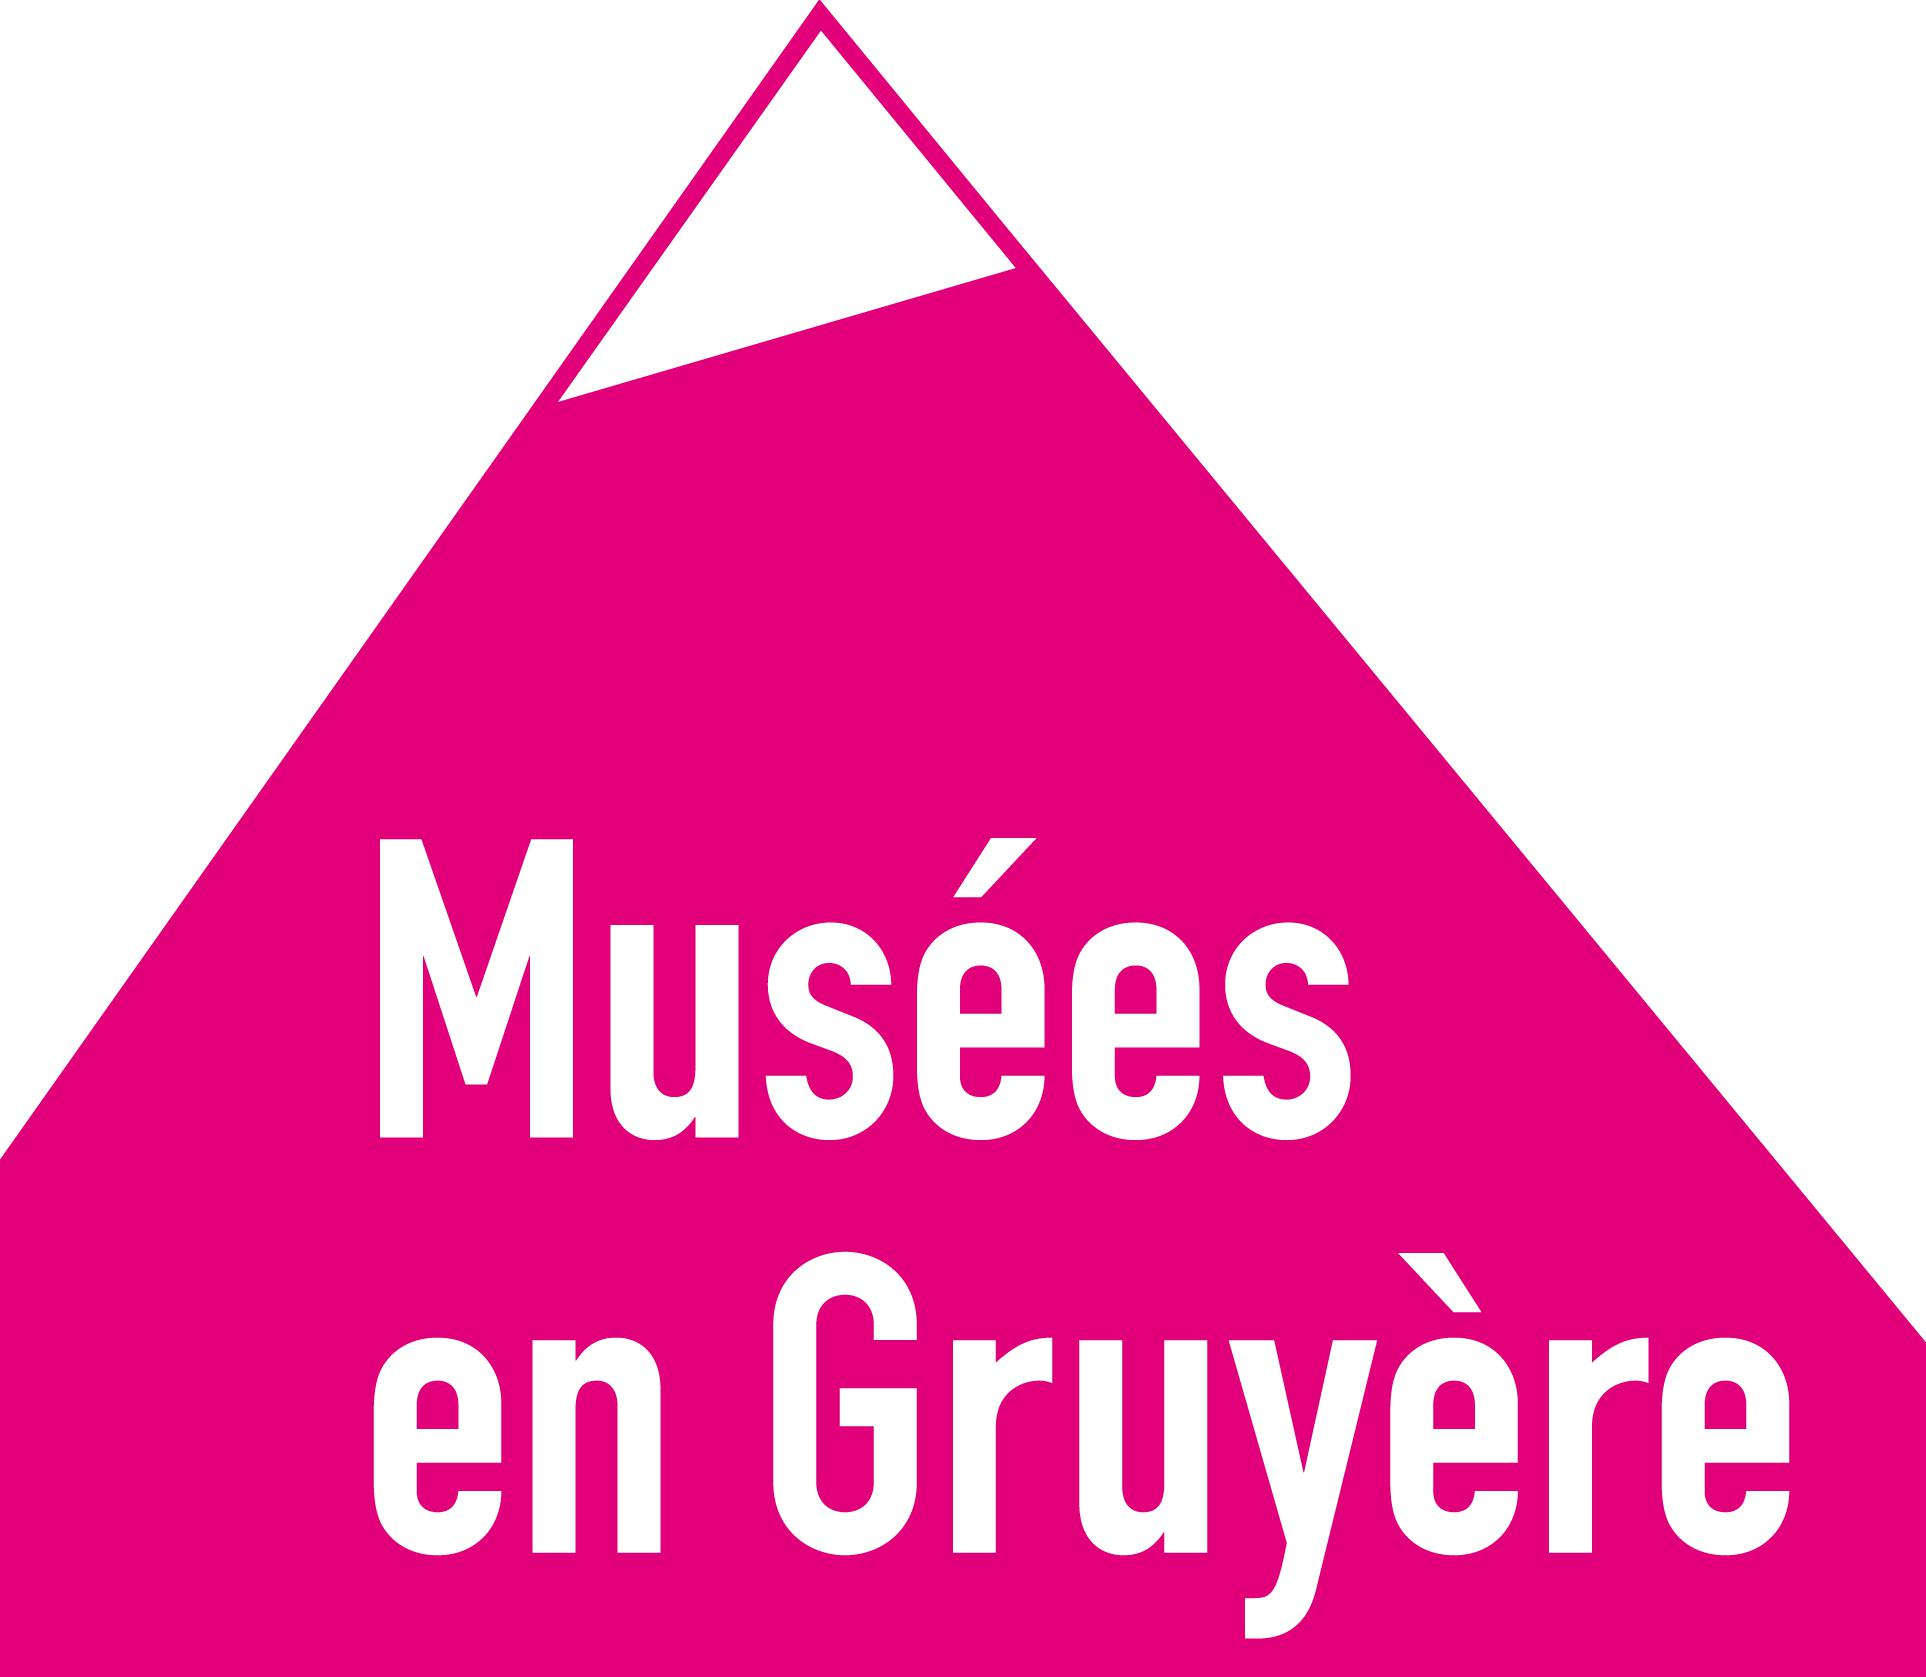 Musées en Gruyère